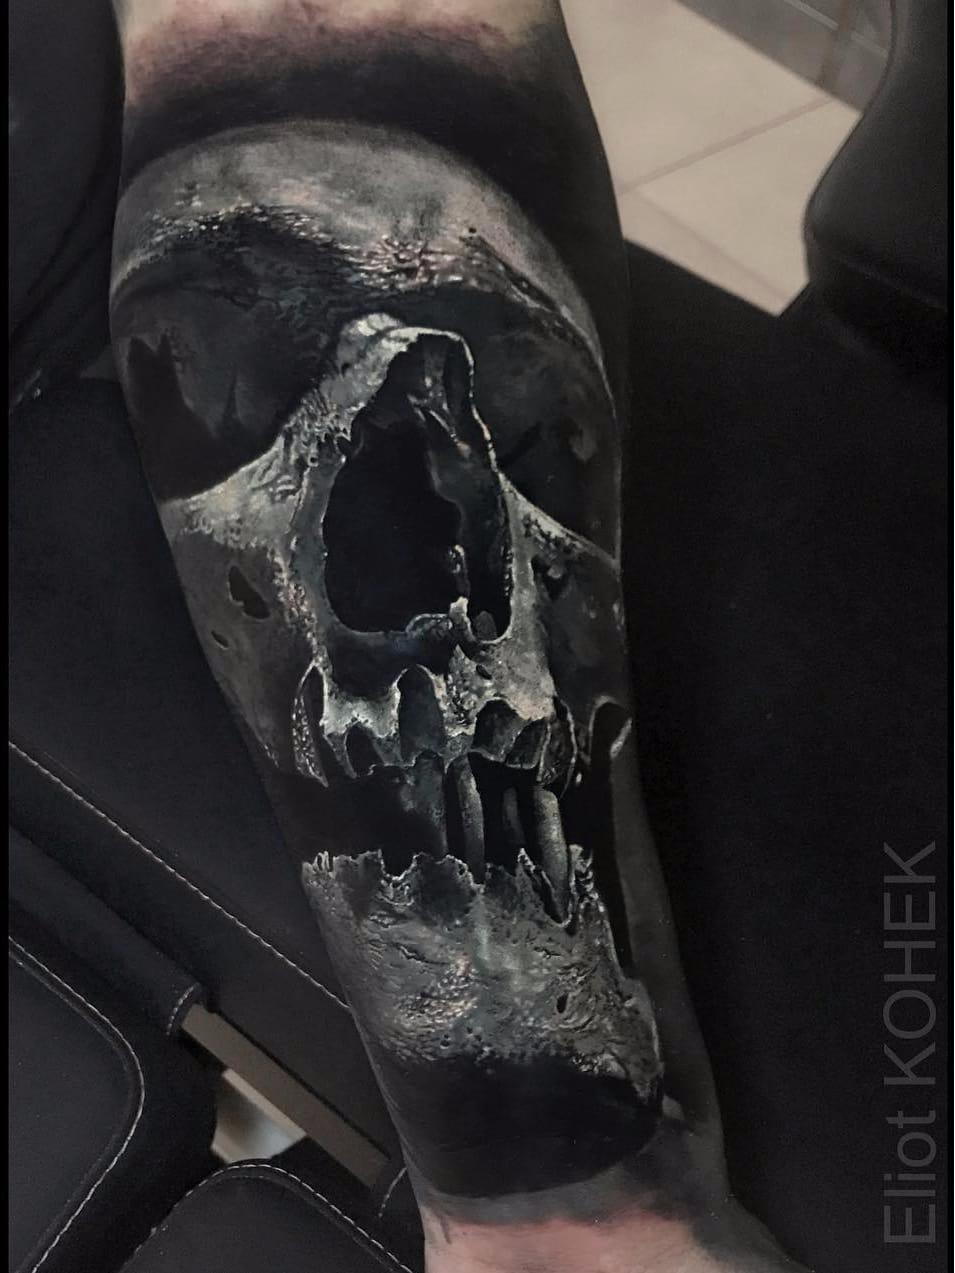 Por Eliot Kohek #EliotKohek #gringo #realismo #realism #pretoecinza #blackandgrey #skull #caveira #cranio #dark #terror #horror